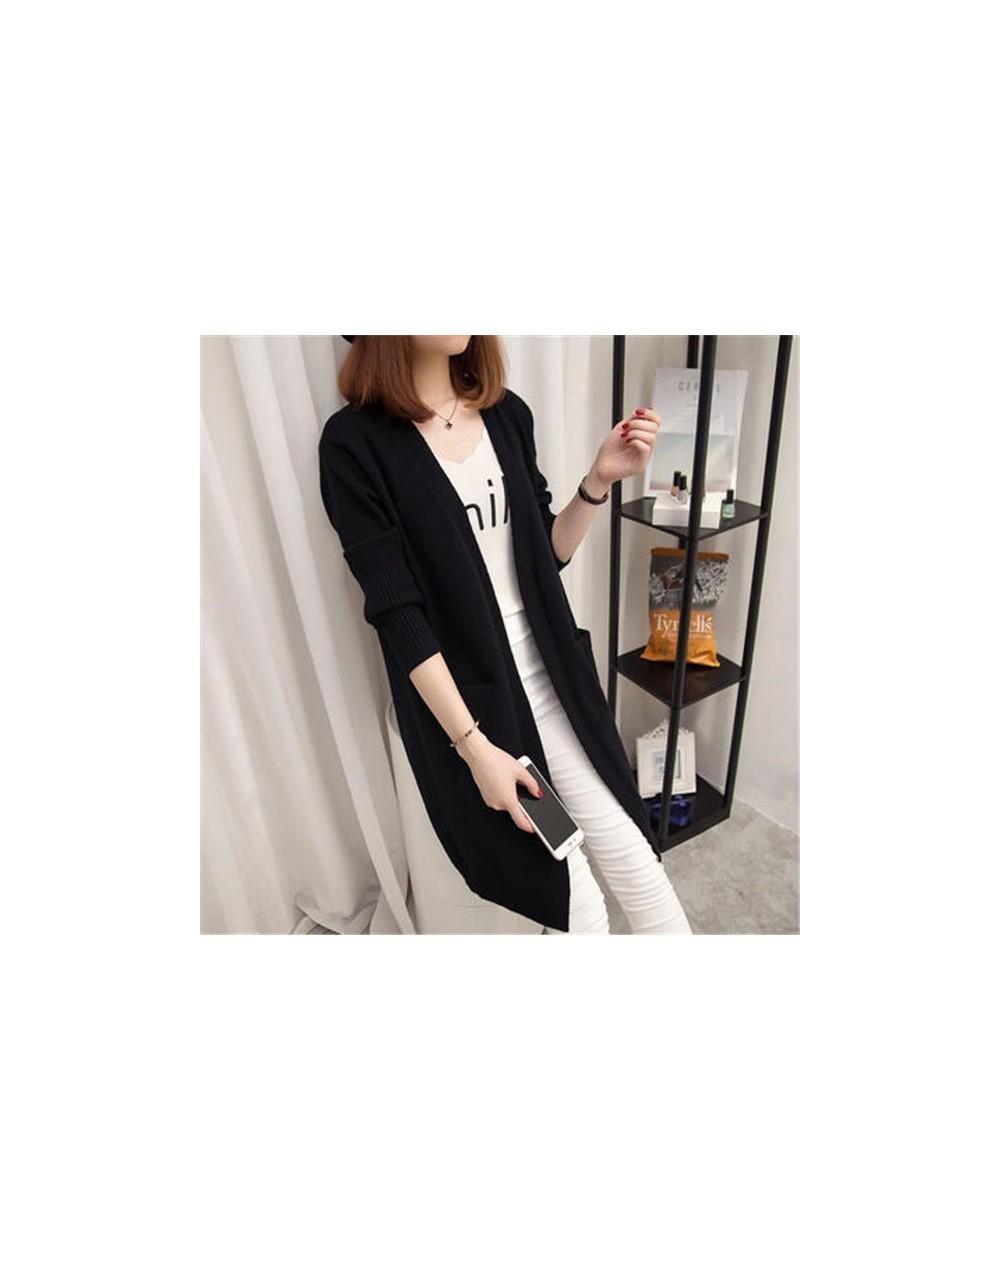 New Women Spring/Autumn Sweater Long Cardigan Jacket Korean Slim Pocket Loose Pull Knit Sweater Outwear Coat Casual Female T...